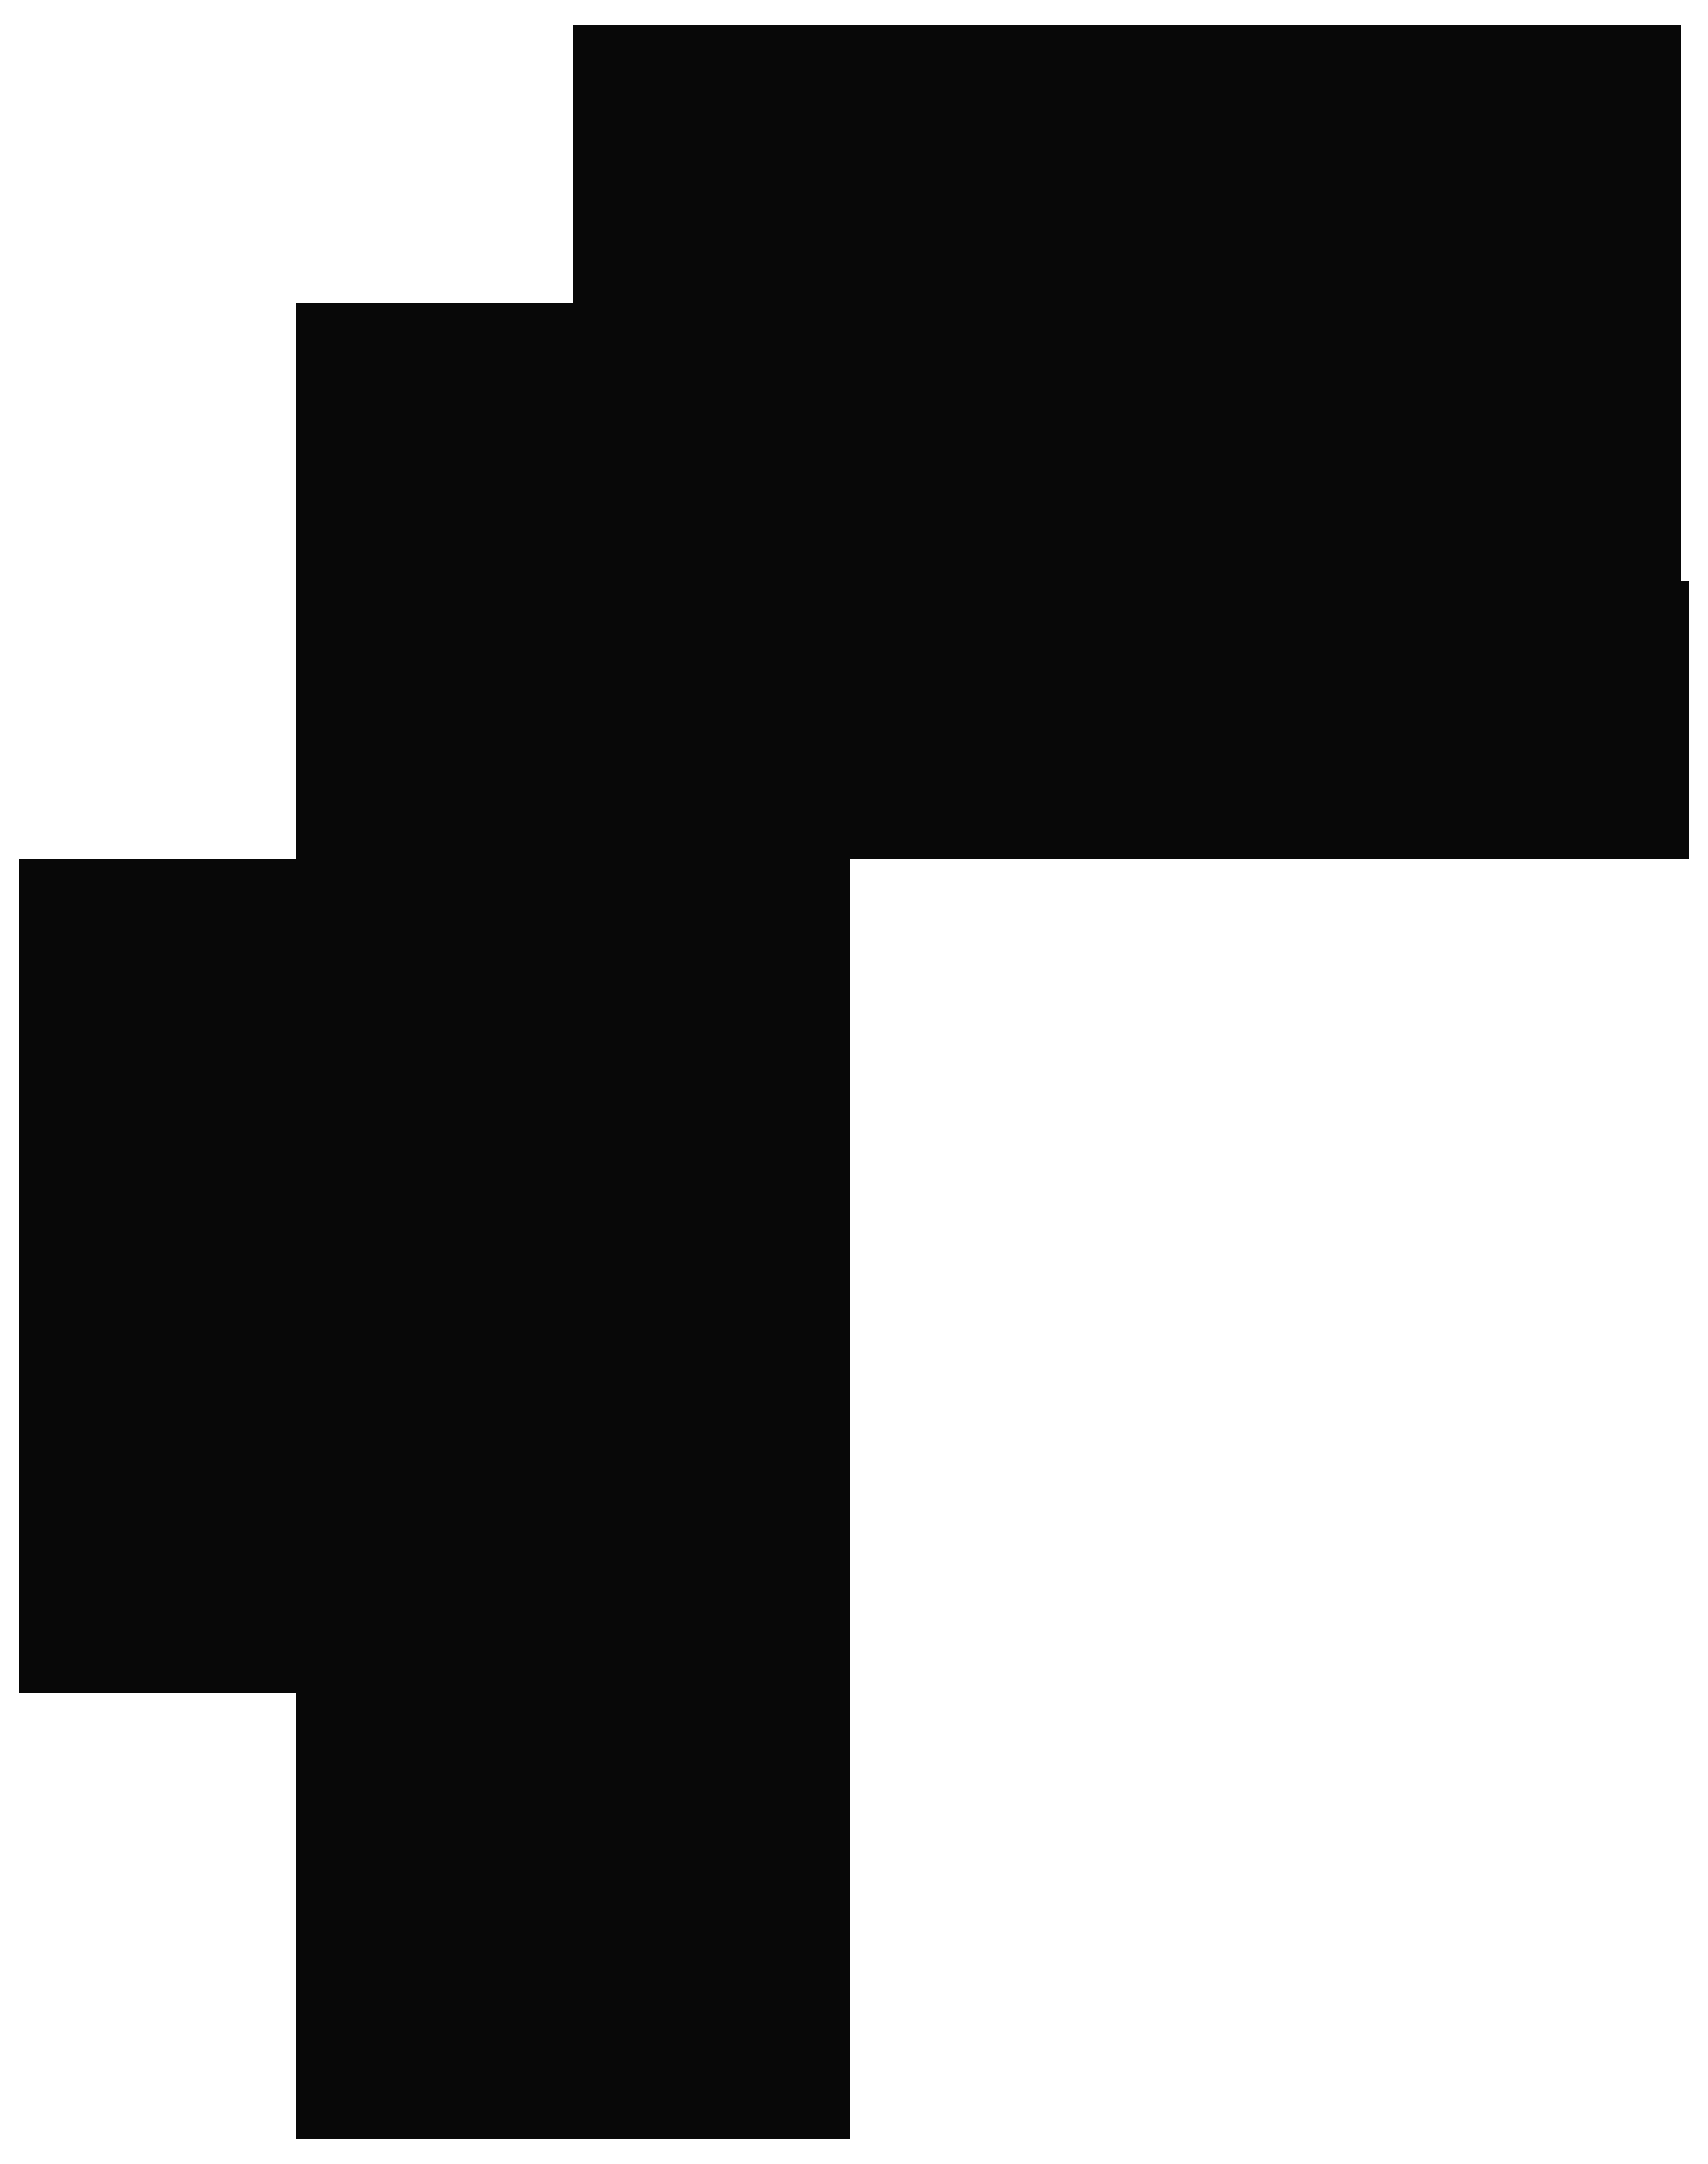 romantic couple silhouettes png clip art image silhouettes rh pinterest co uk romantic clip art free romance clipart free